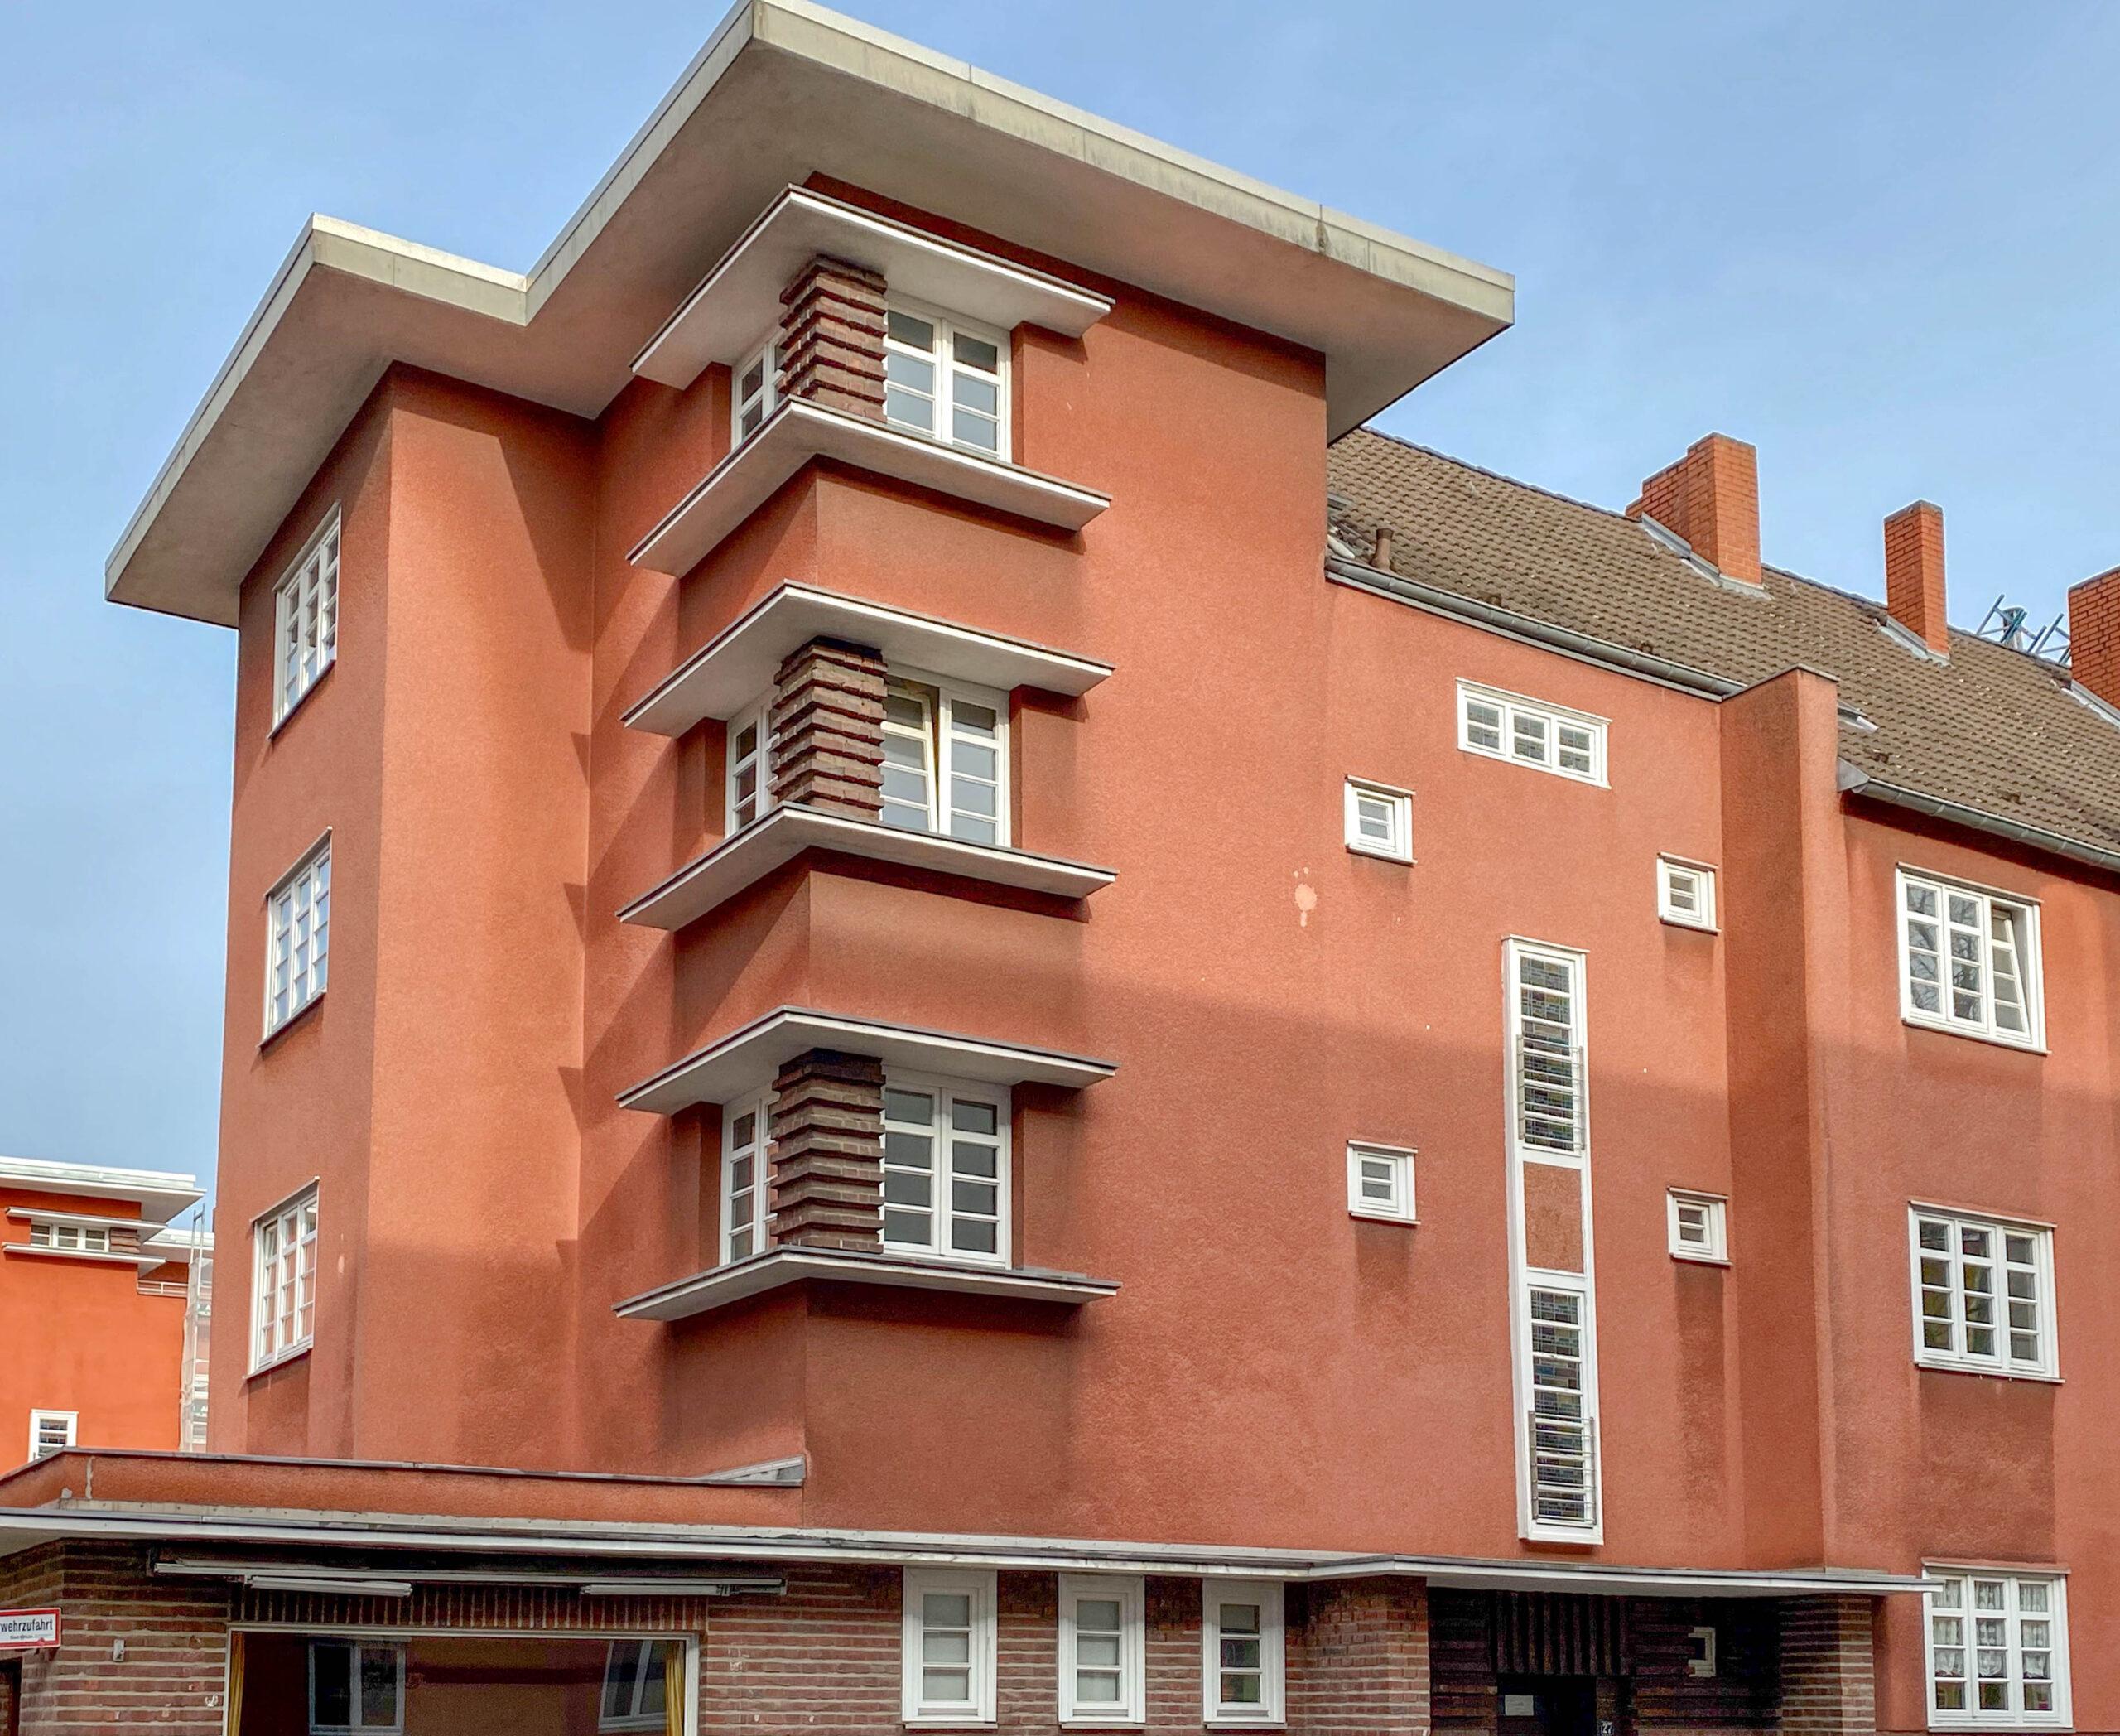 GAG Siedlung Alpener Straße, 1927-1928. Architekt: Otto Müller-Jena